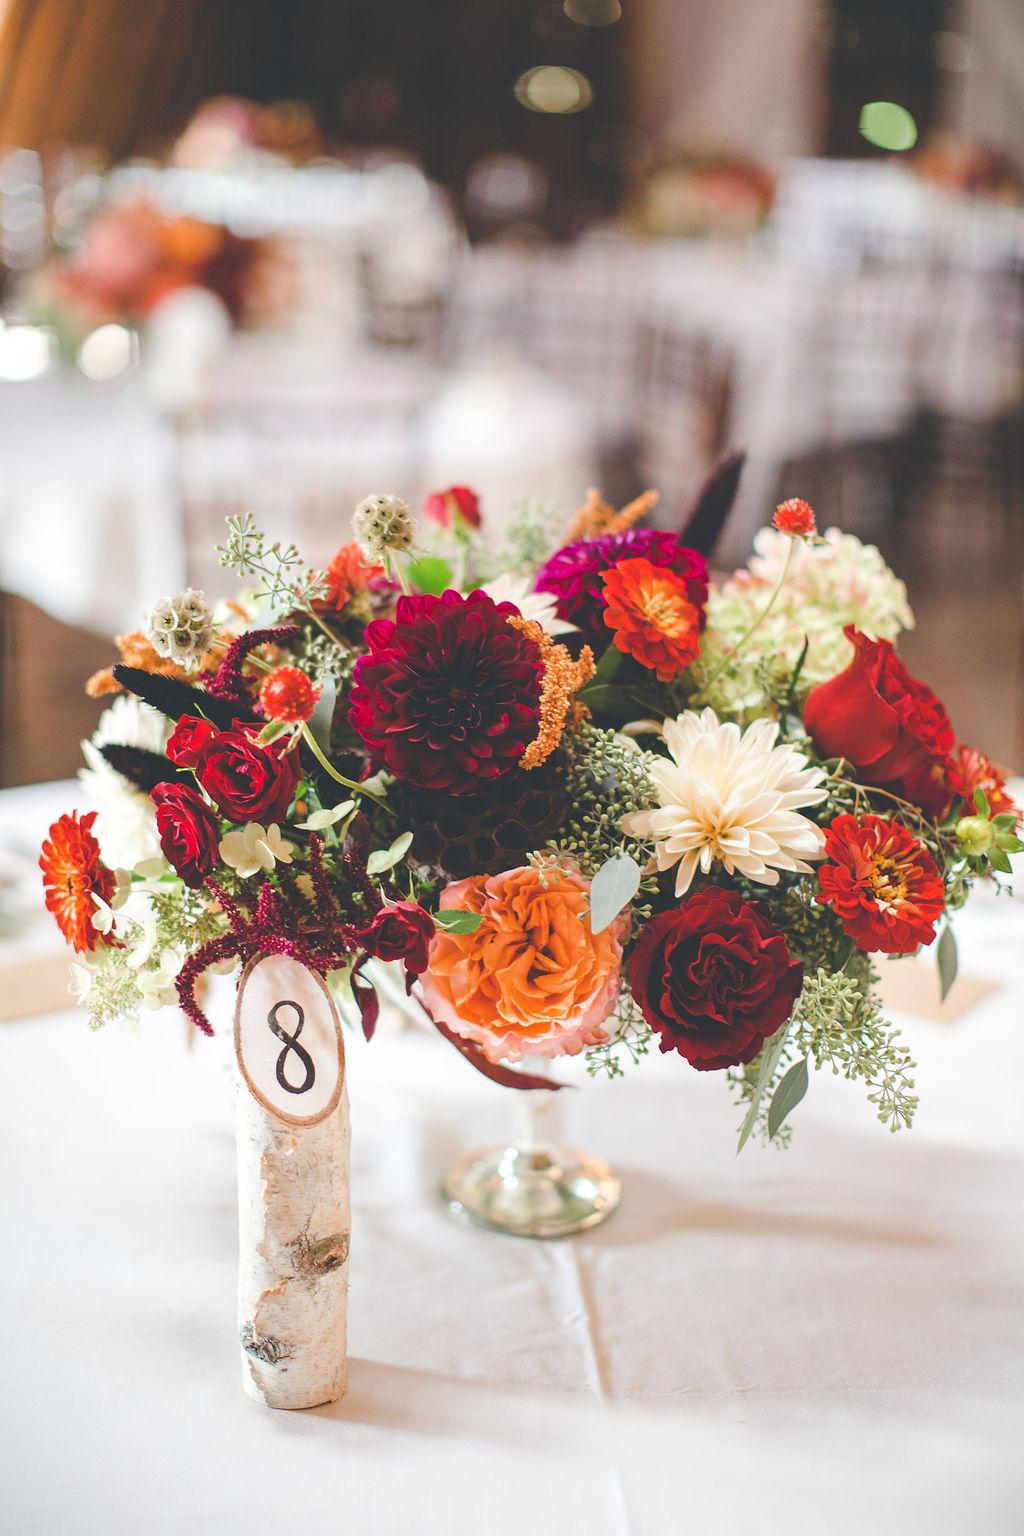 low centerpiece, wedding centerpiece, compote centerpiece, fall flower, dark red wedding flowers, wedding decor, reception decor, florist, wedding florist, Dayton Ohio florist, Cincinnati florist, dayton wedding flowers